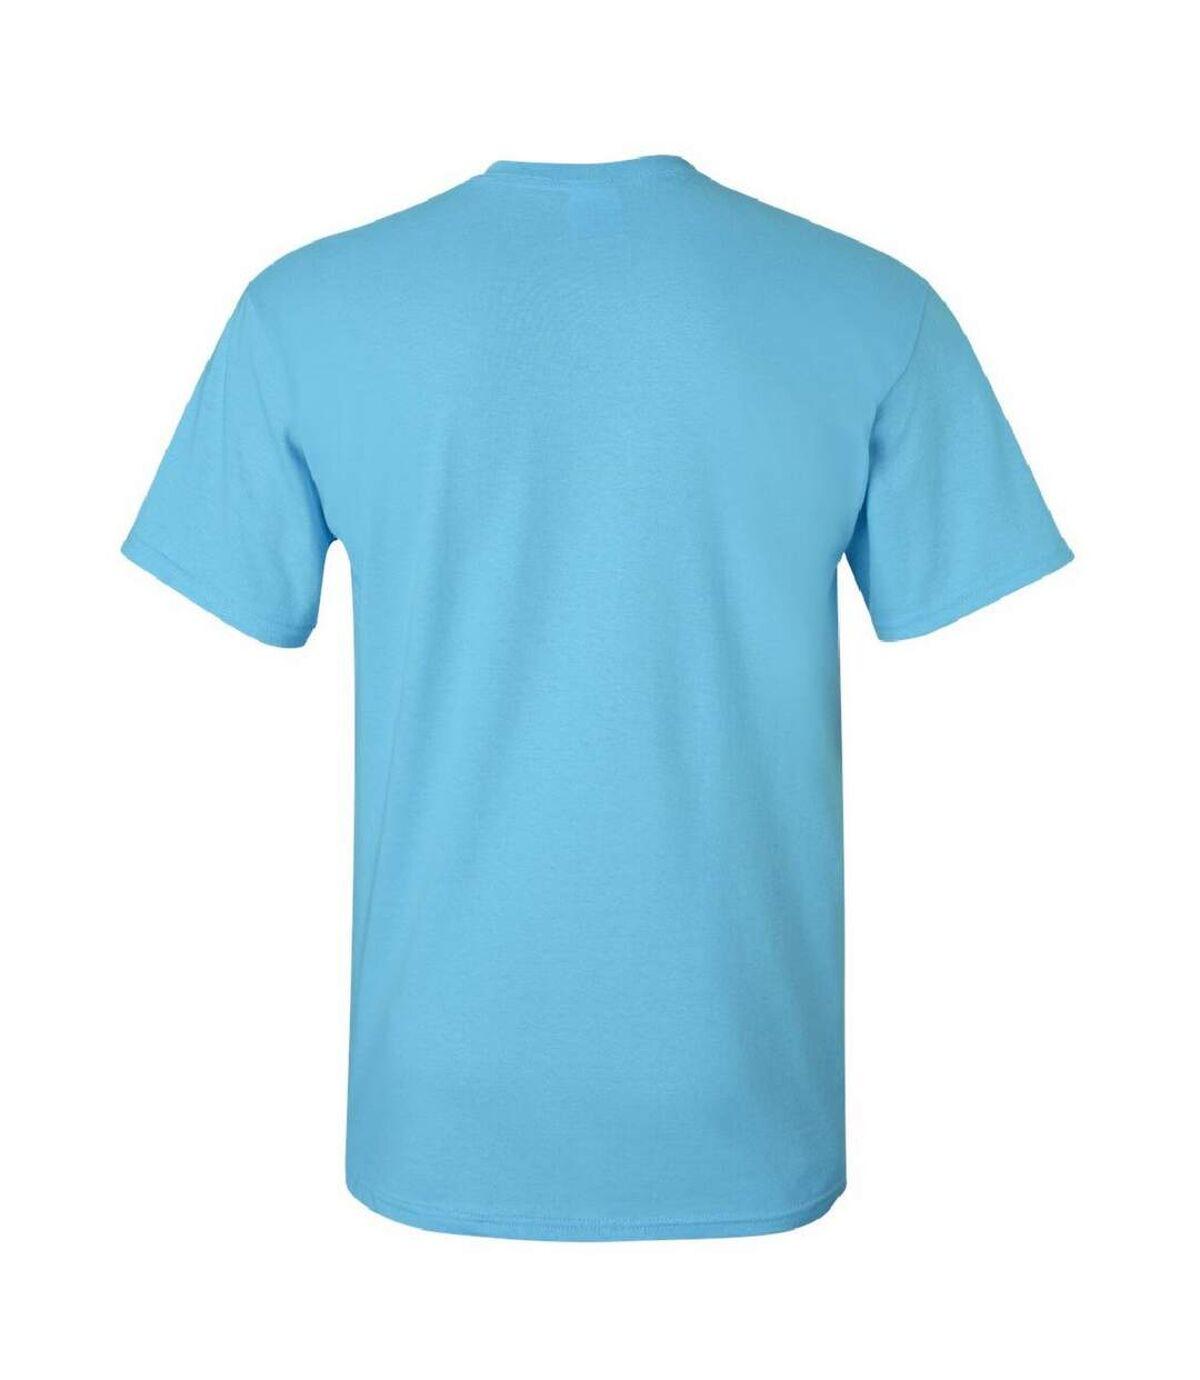 Gildan Mens Ultra Cotton Short Sleeve T-Shirt (Sky) - UTBC475